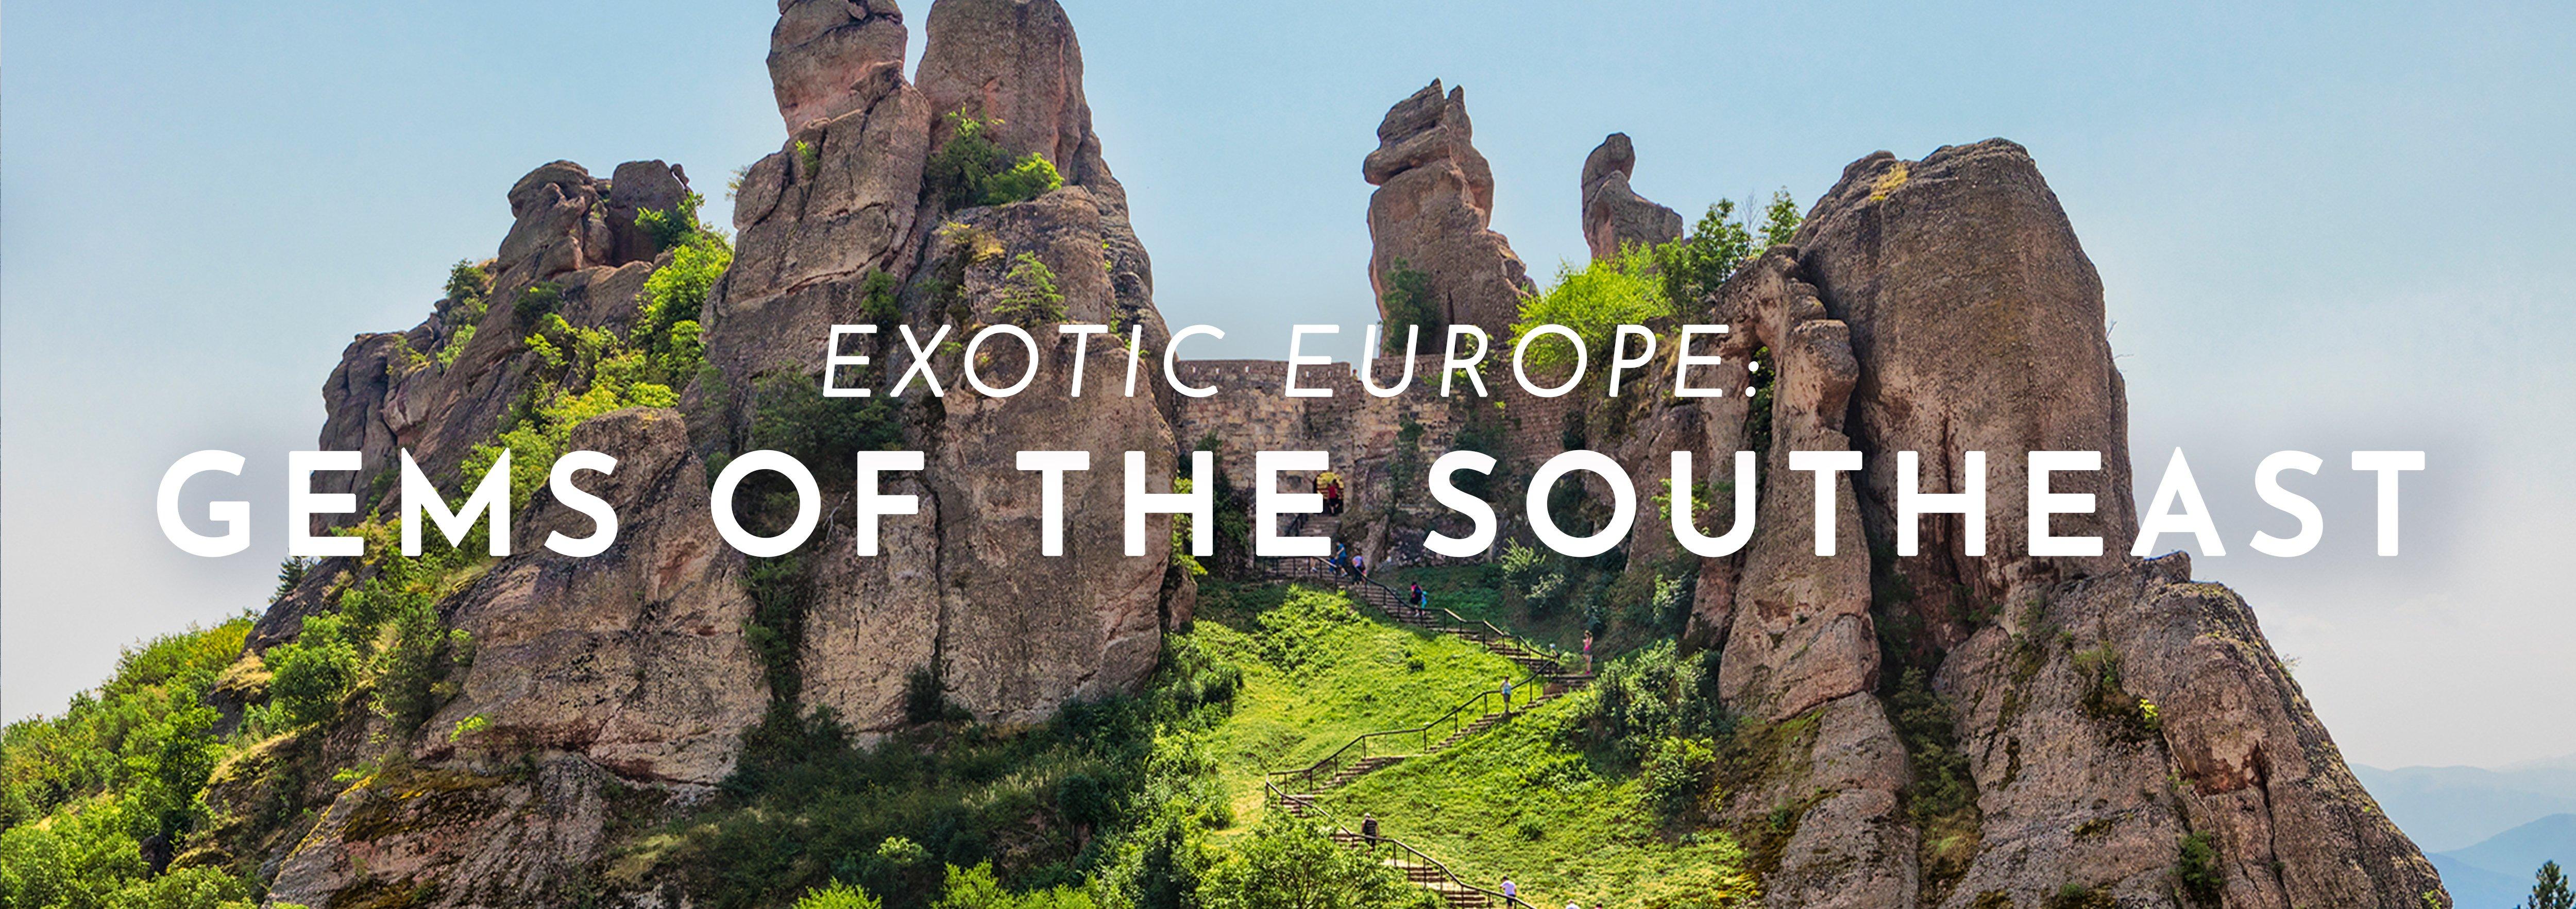 ExoticEuropeHeader